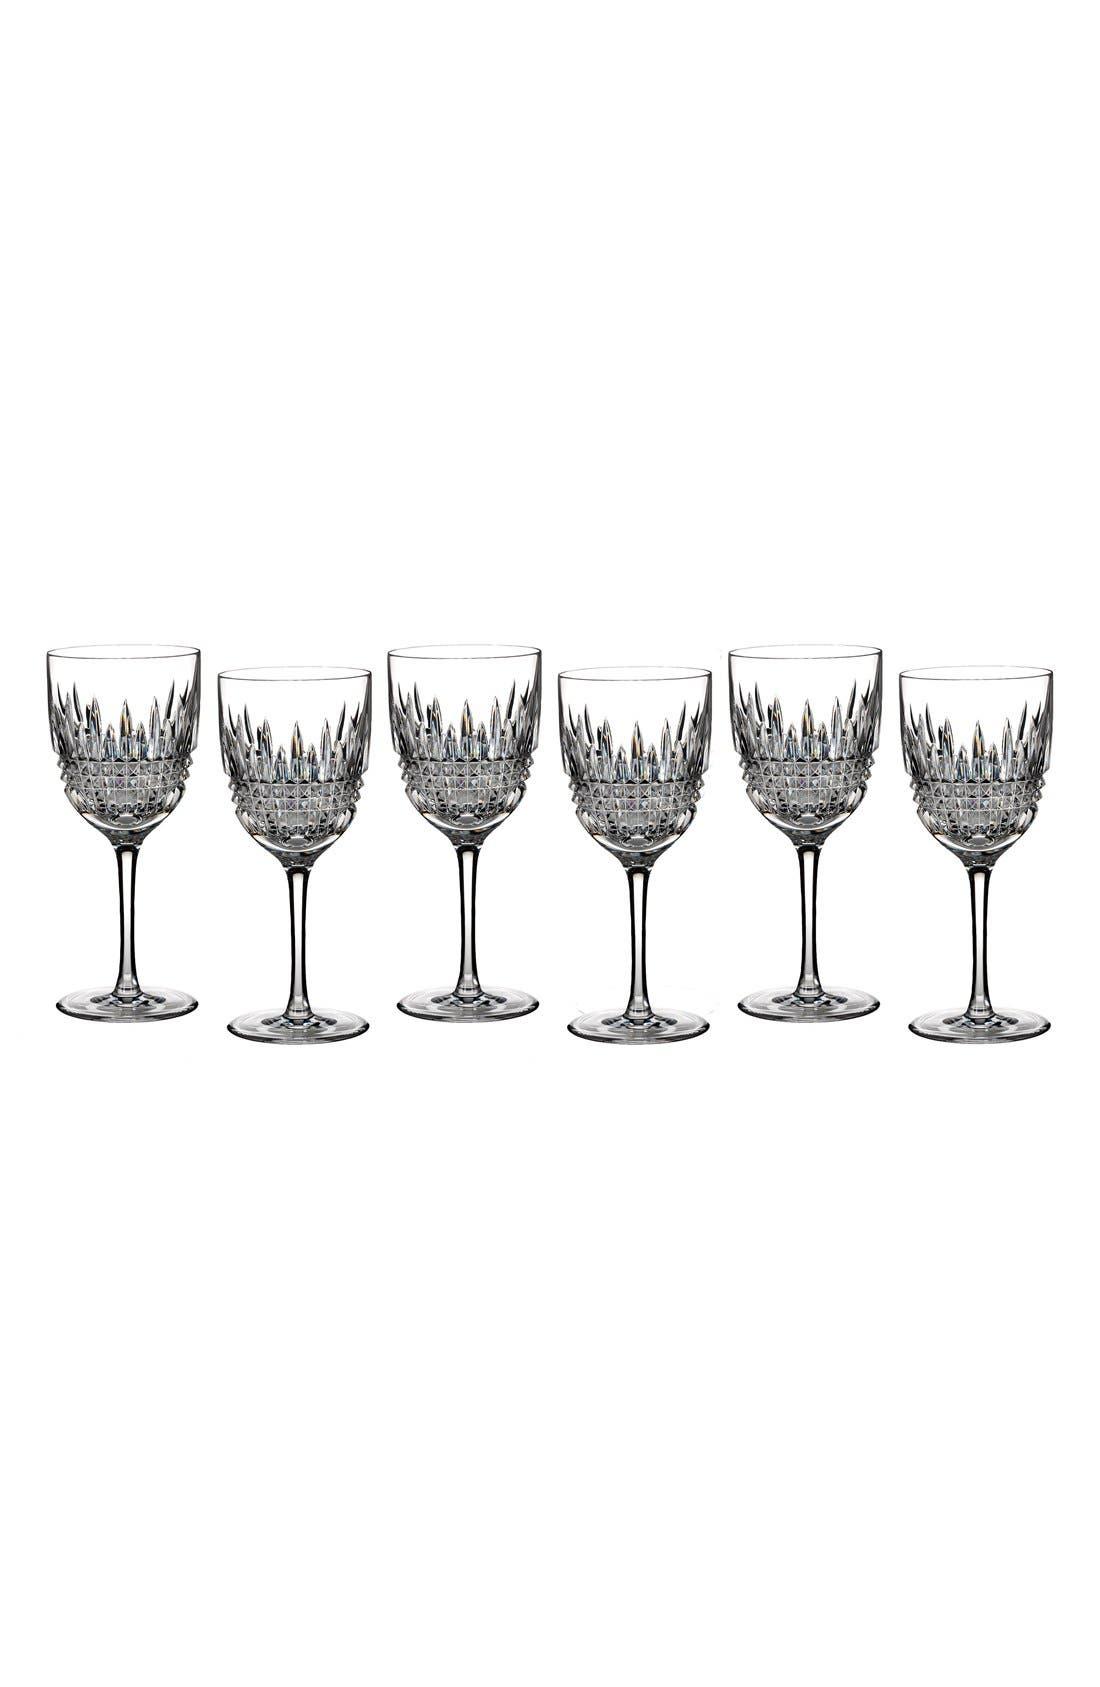 Main Image - Waterford Lismore Diamond Set of 6 Lead Crystal White Wine Glasses